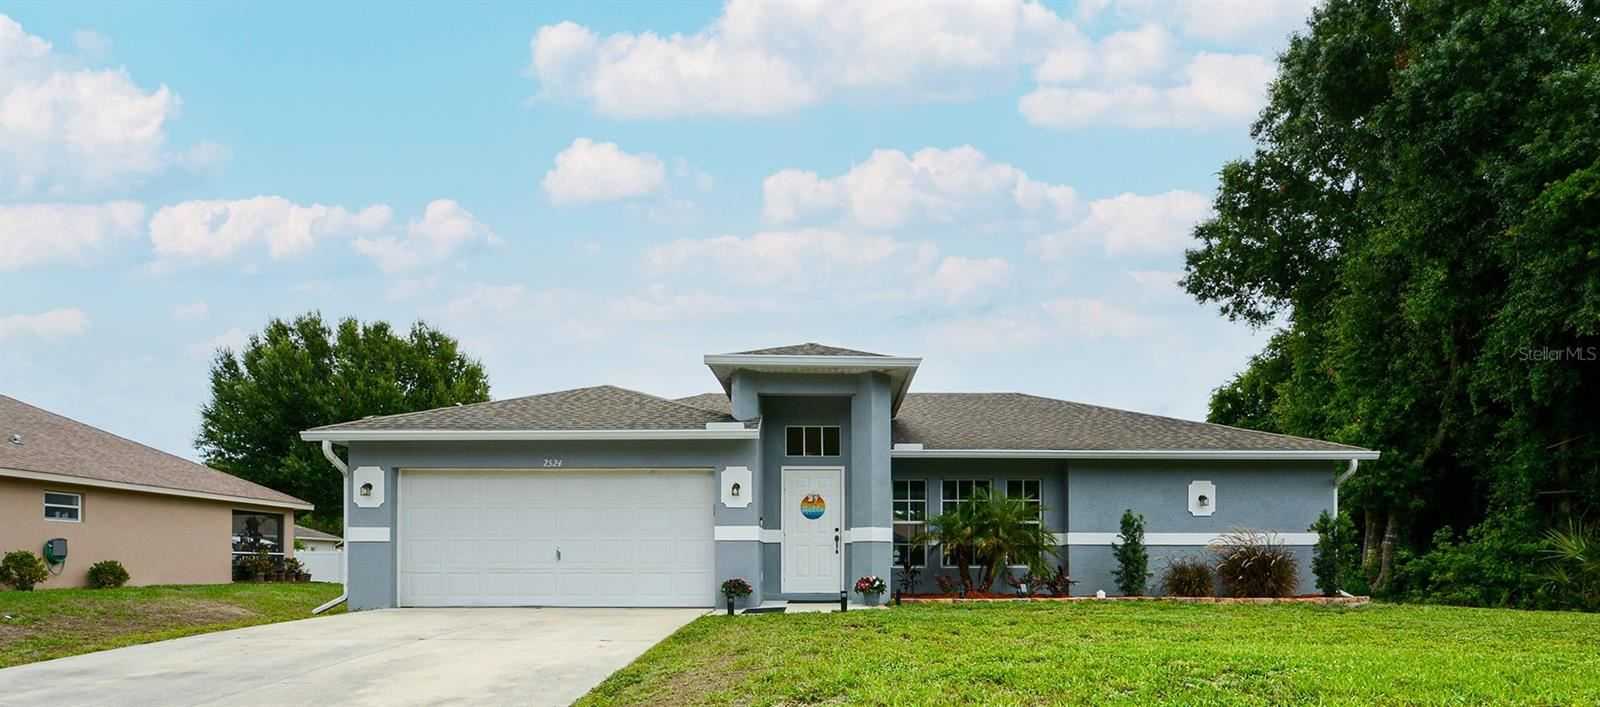 2524 COURTLAND AVENUE, North Port, FL 34286 - #: A4503013